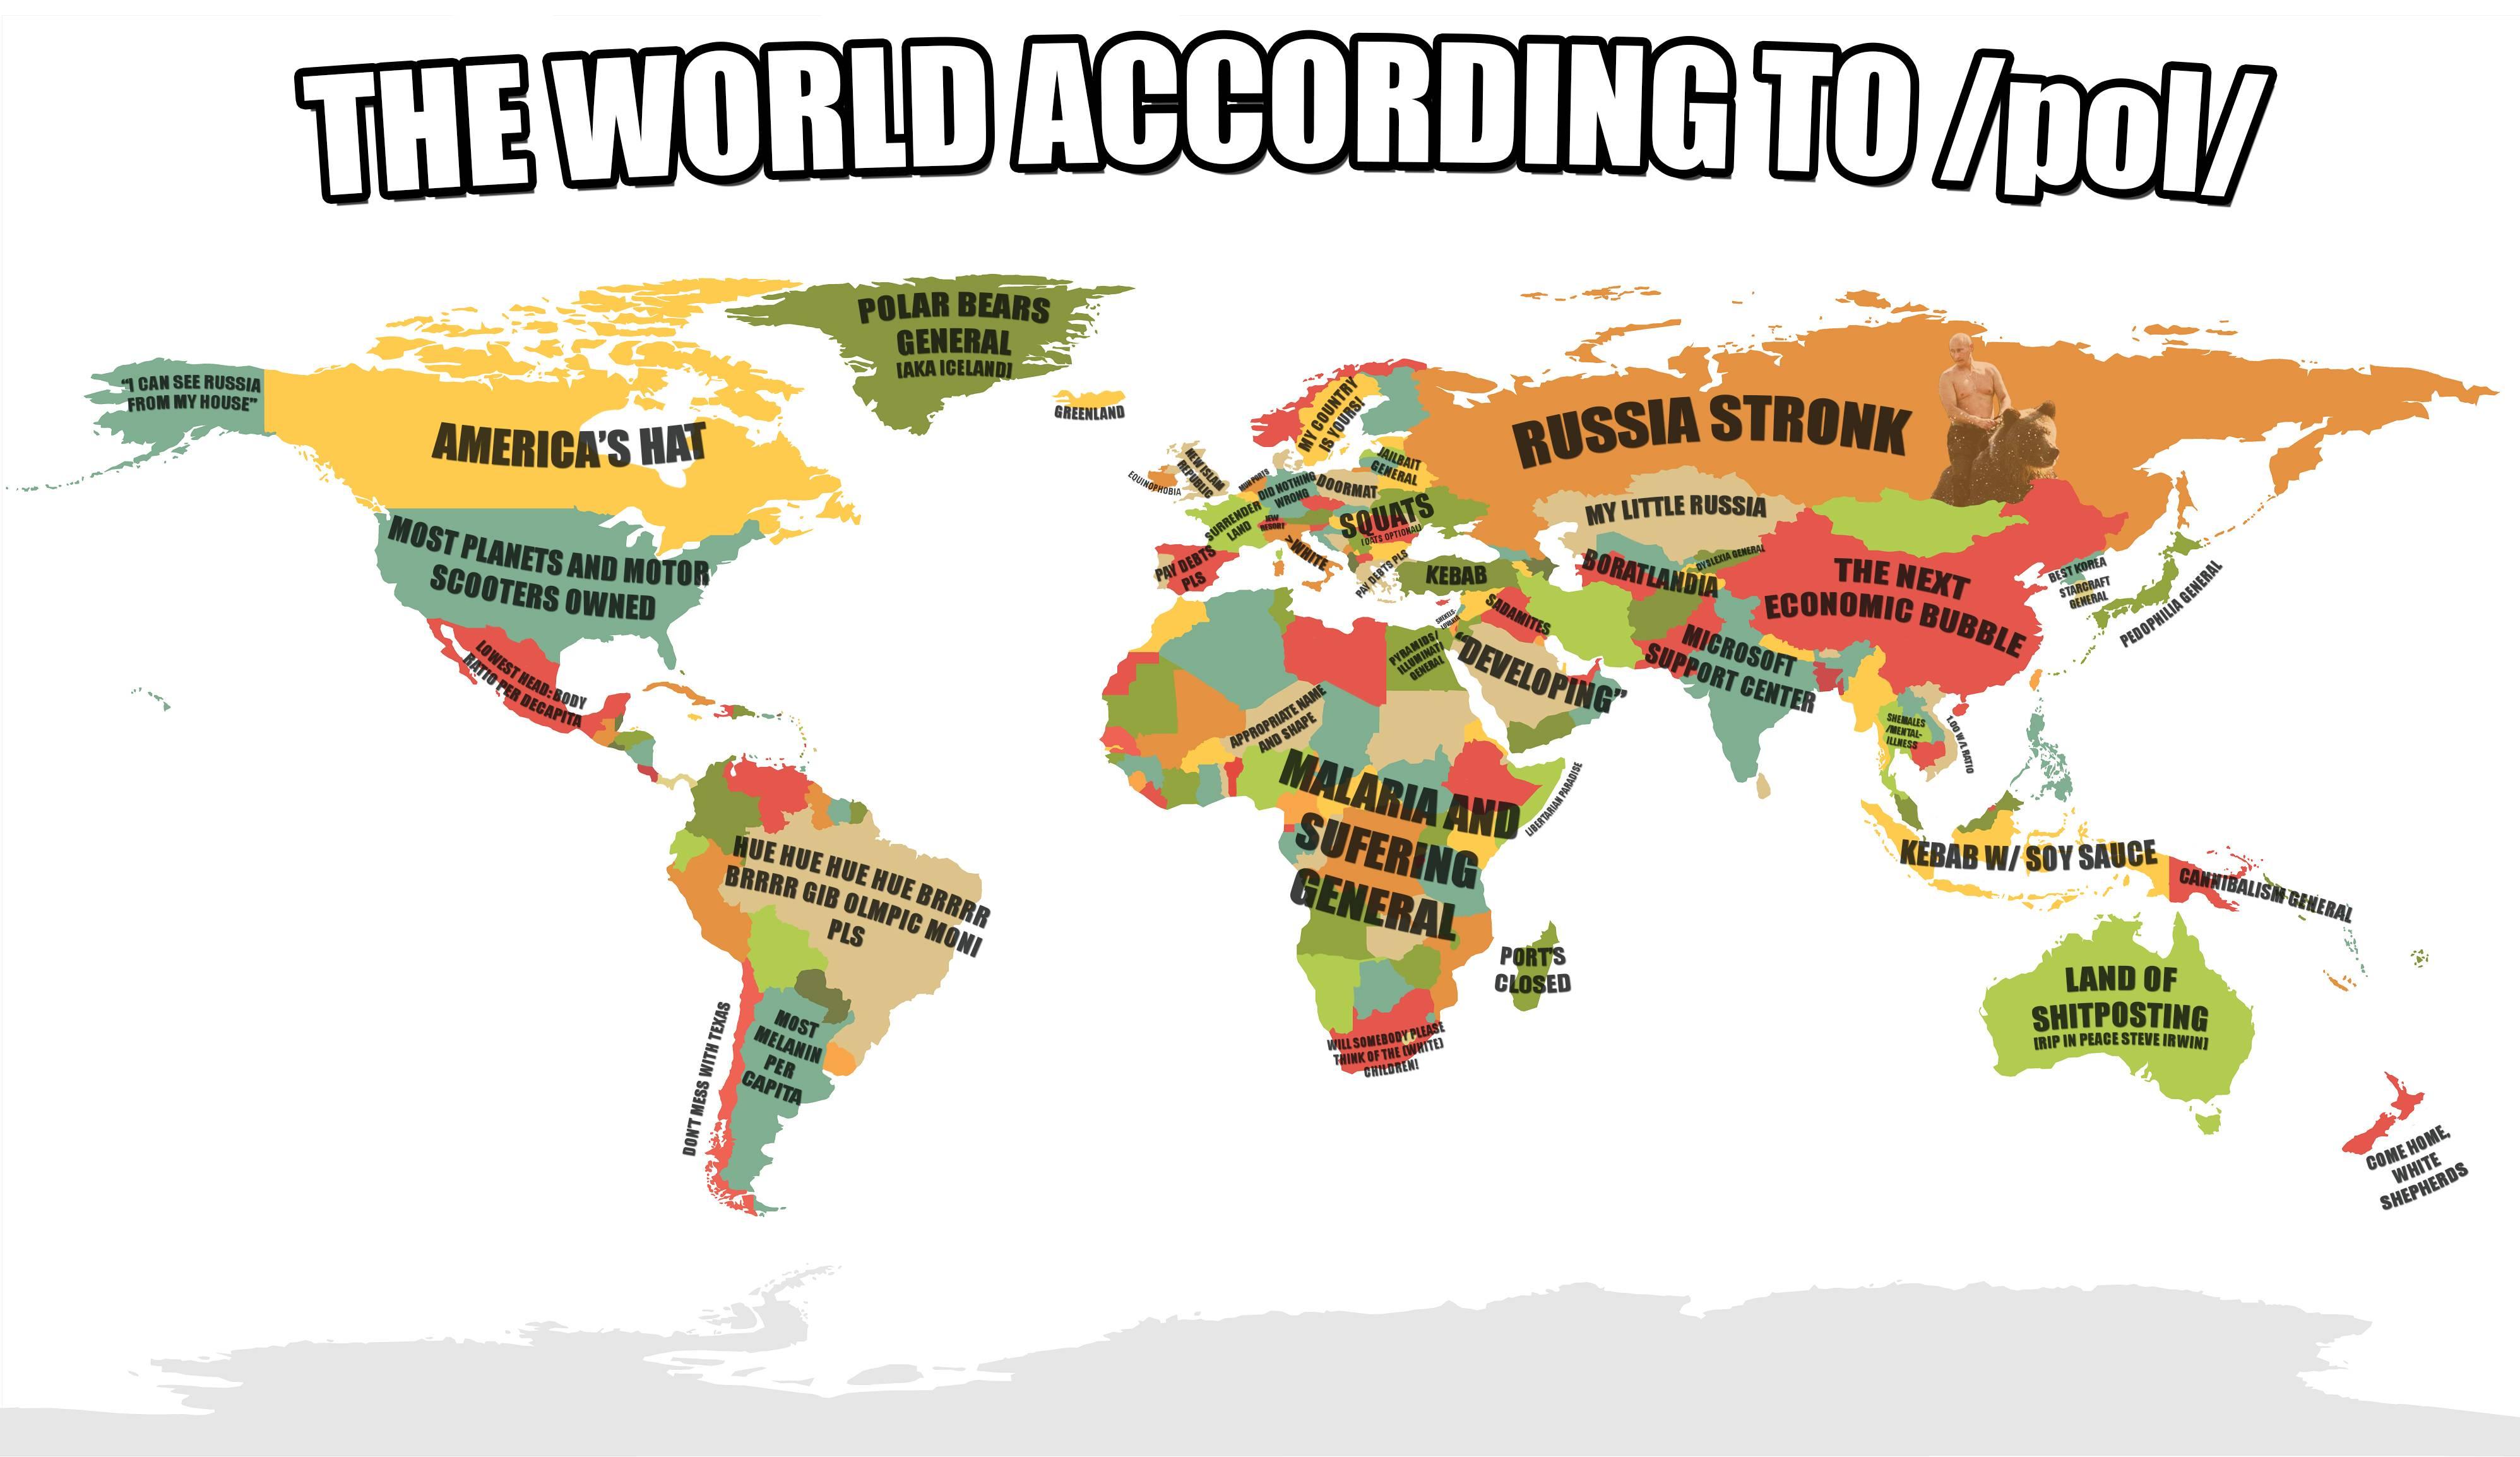 b8f the world according to pol (bigger, less dense) pol know